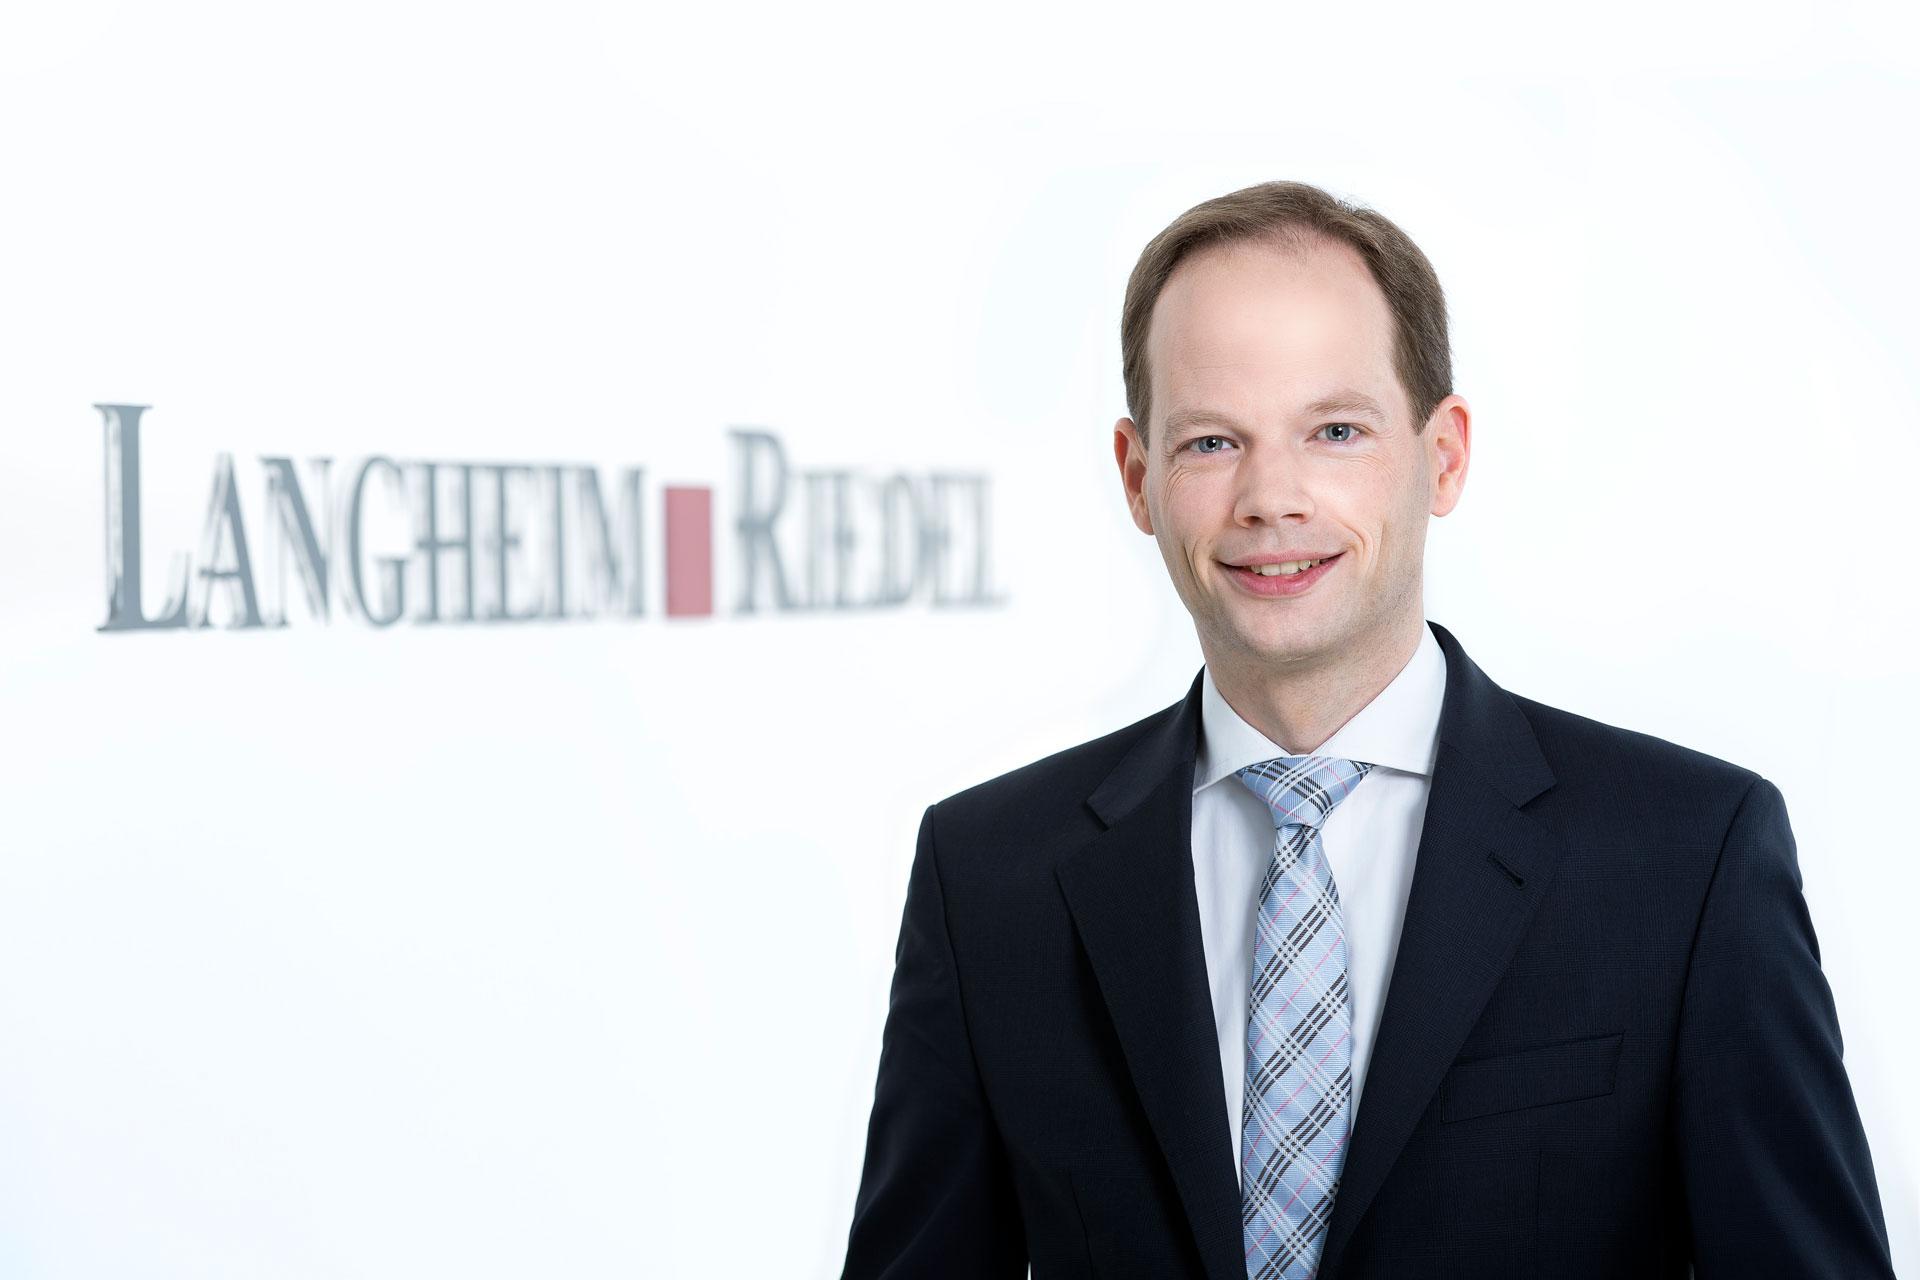 Dr. Marcus Fleige